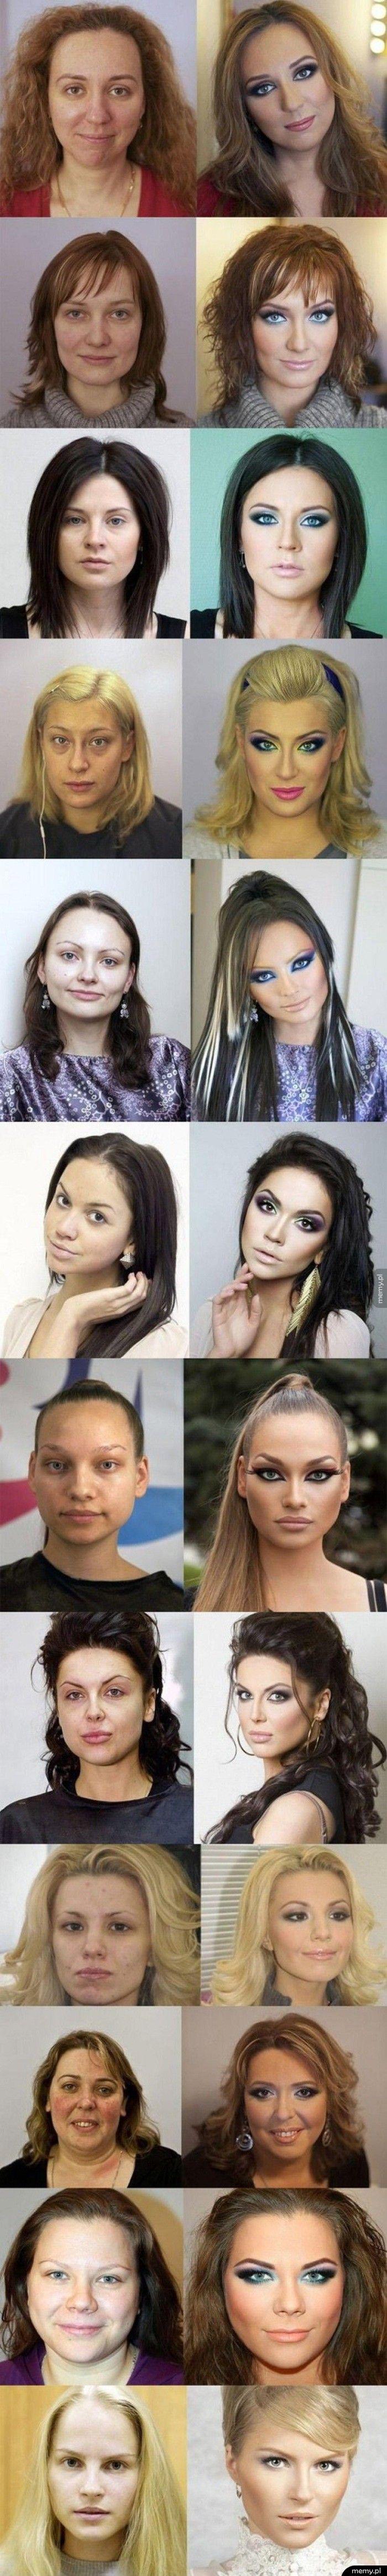 Potęga makijażu